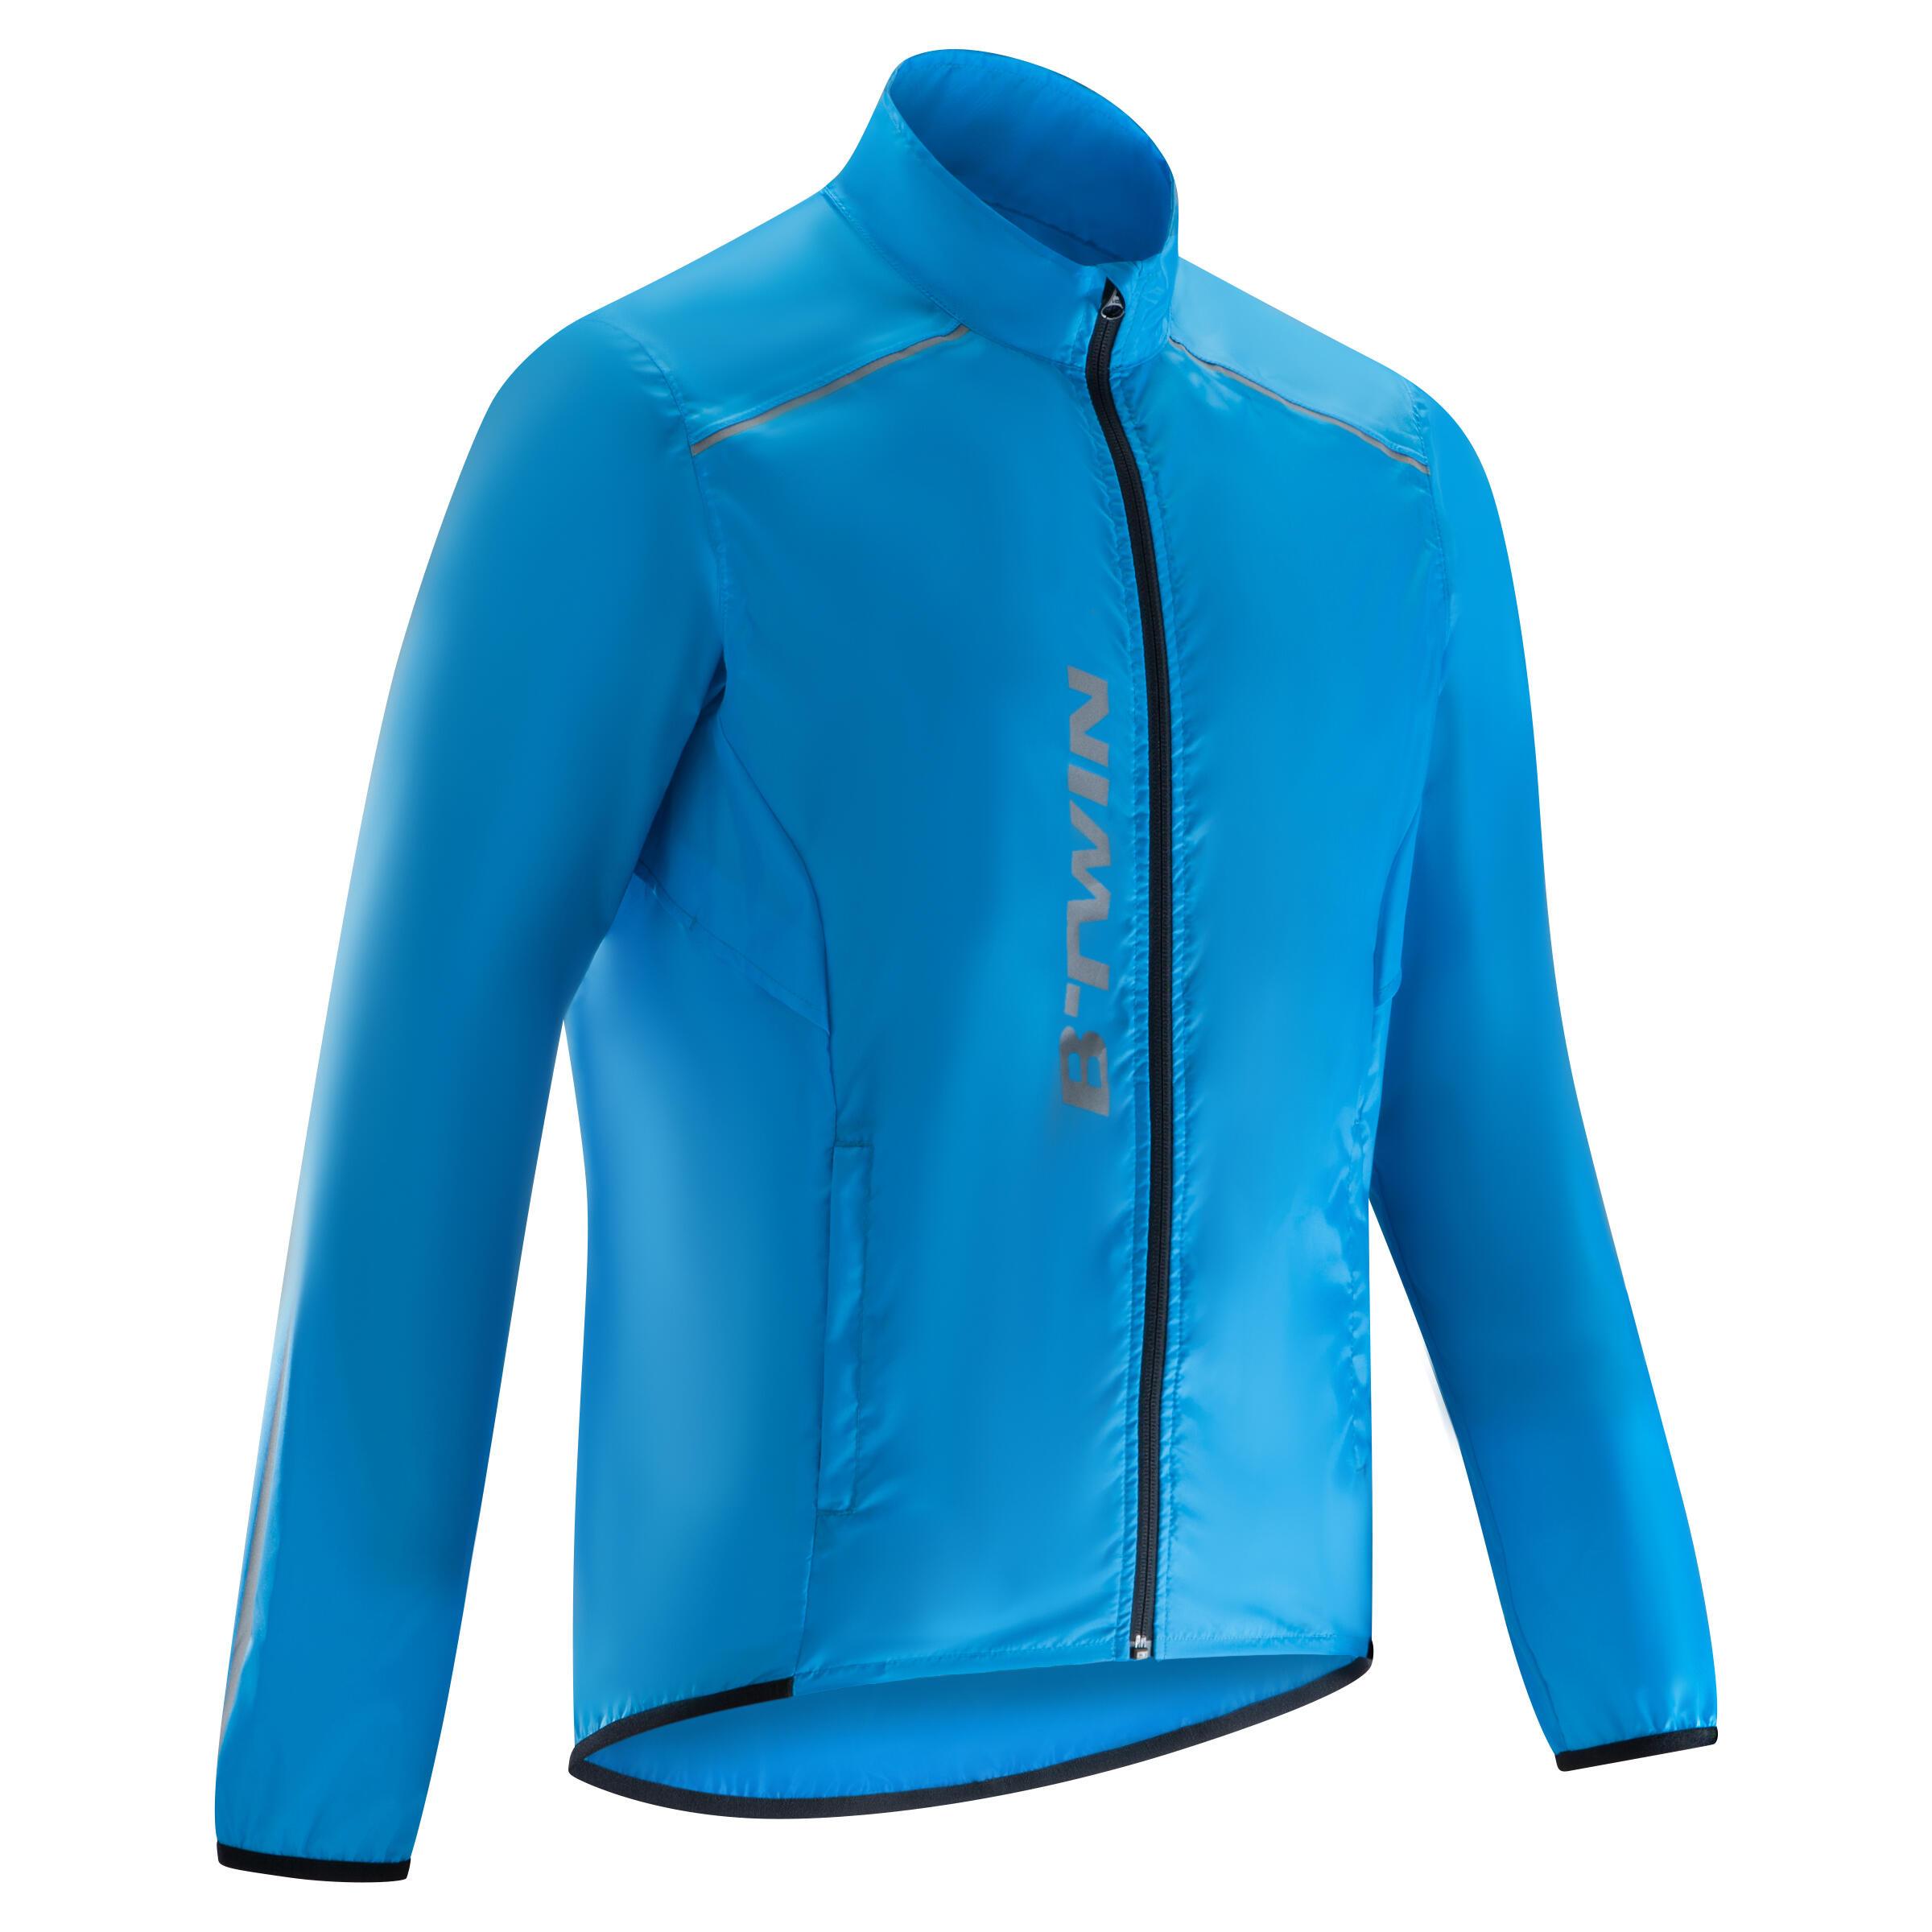 100 Cycling Showerproof Jacket - Blue